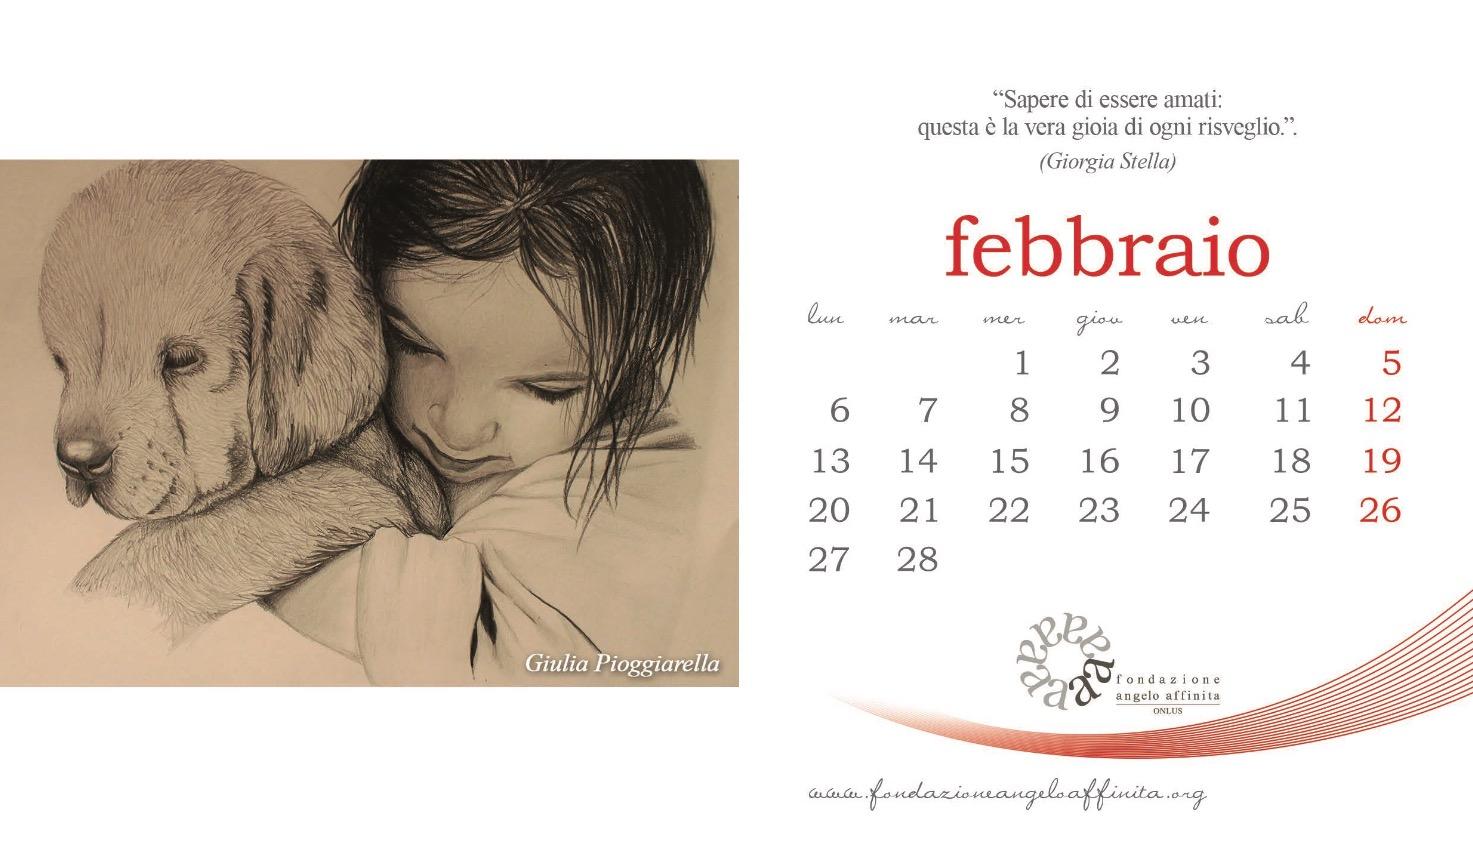 calendario-2017-fondazione-angelo-affinita_3